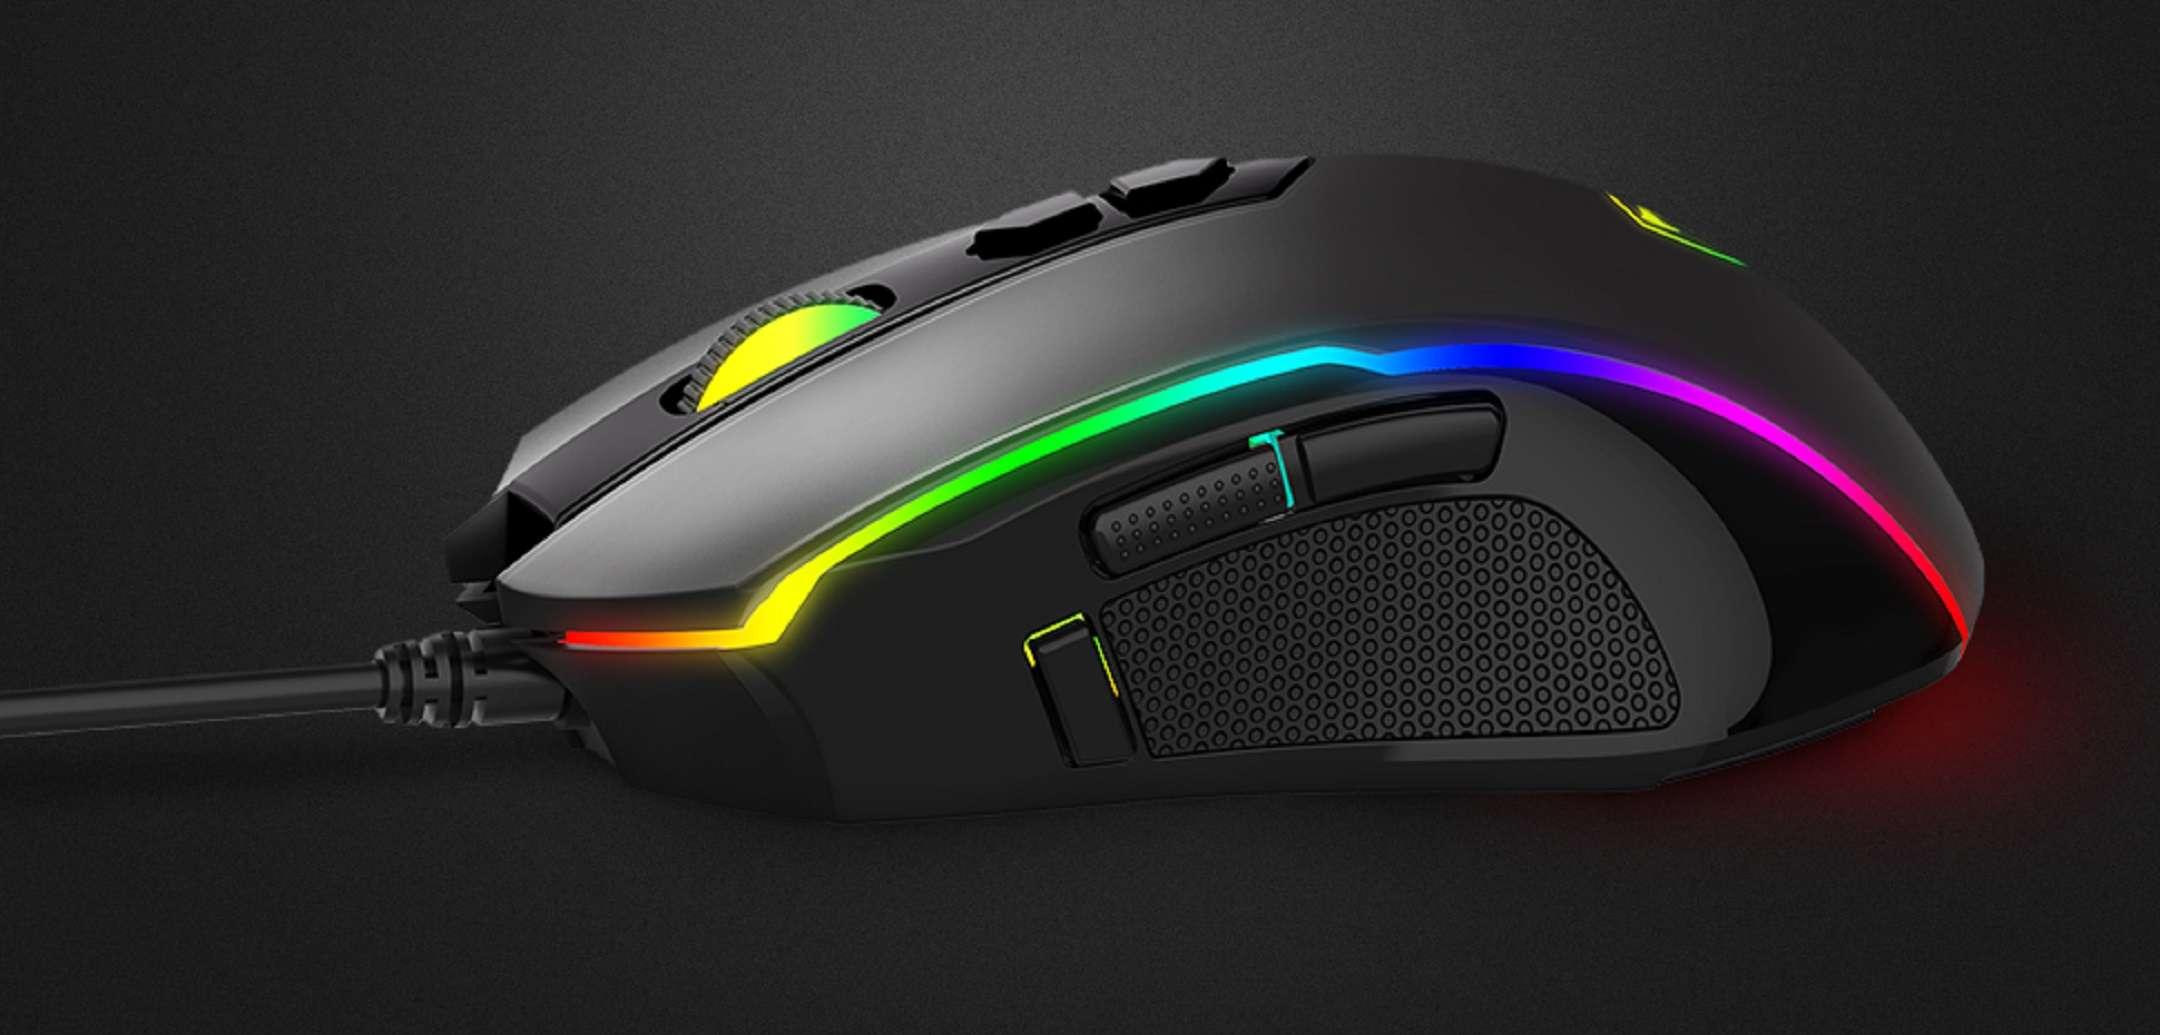 Pictek gaming mouse: on offer for only 17 euros